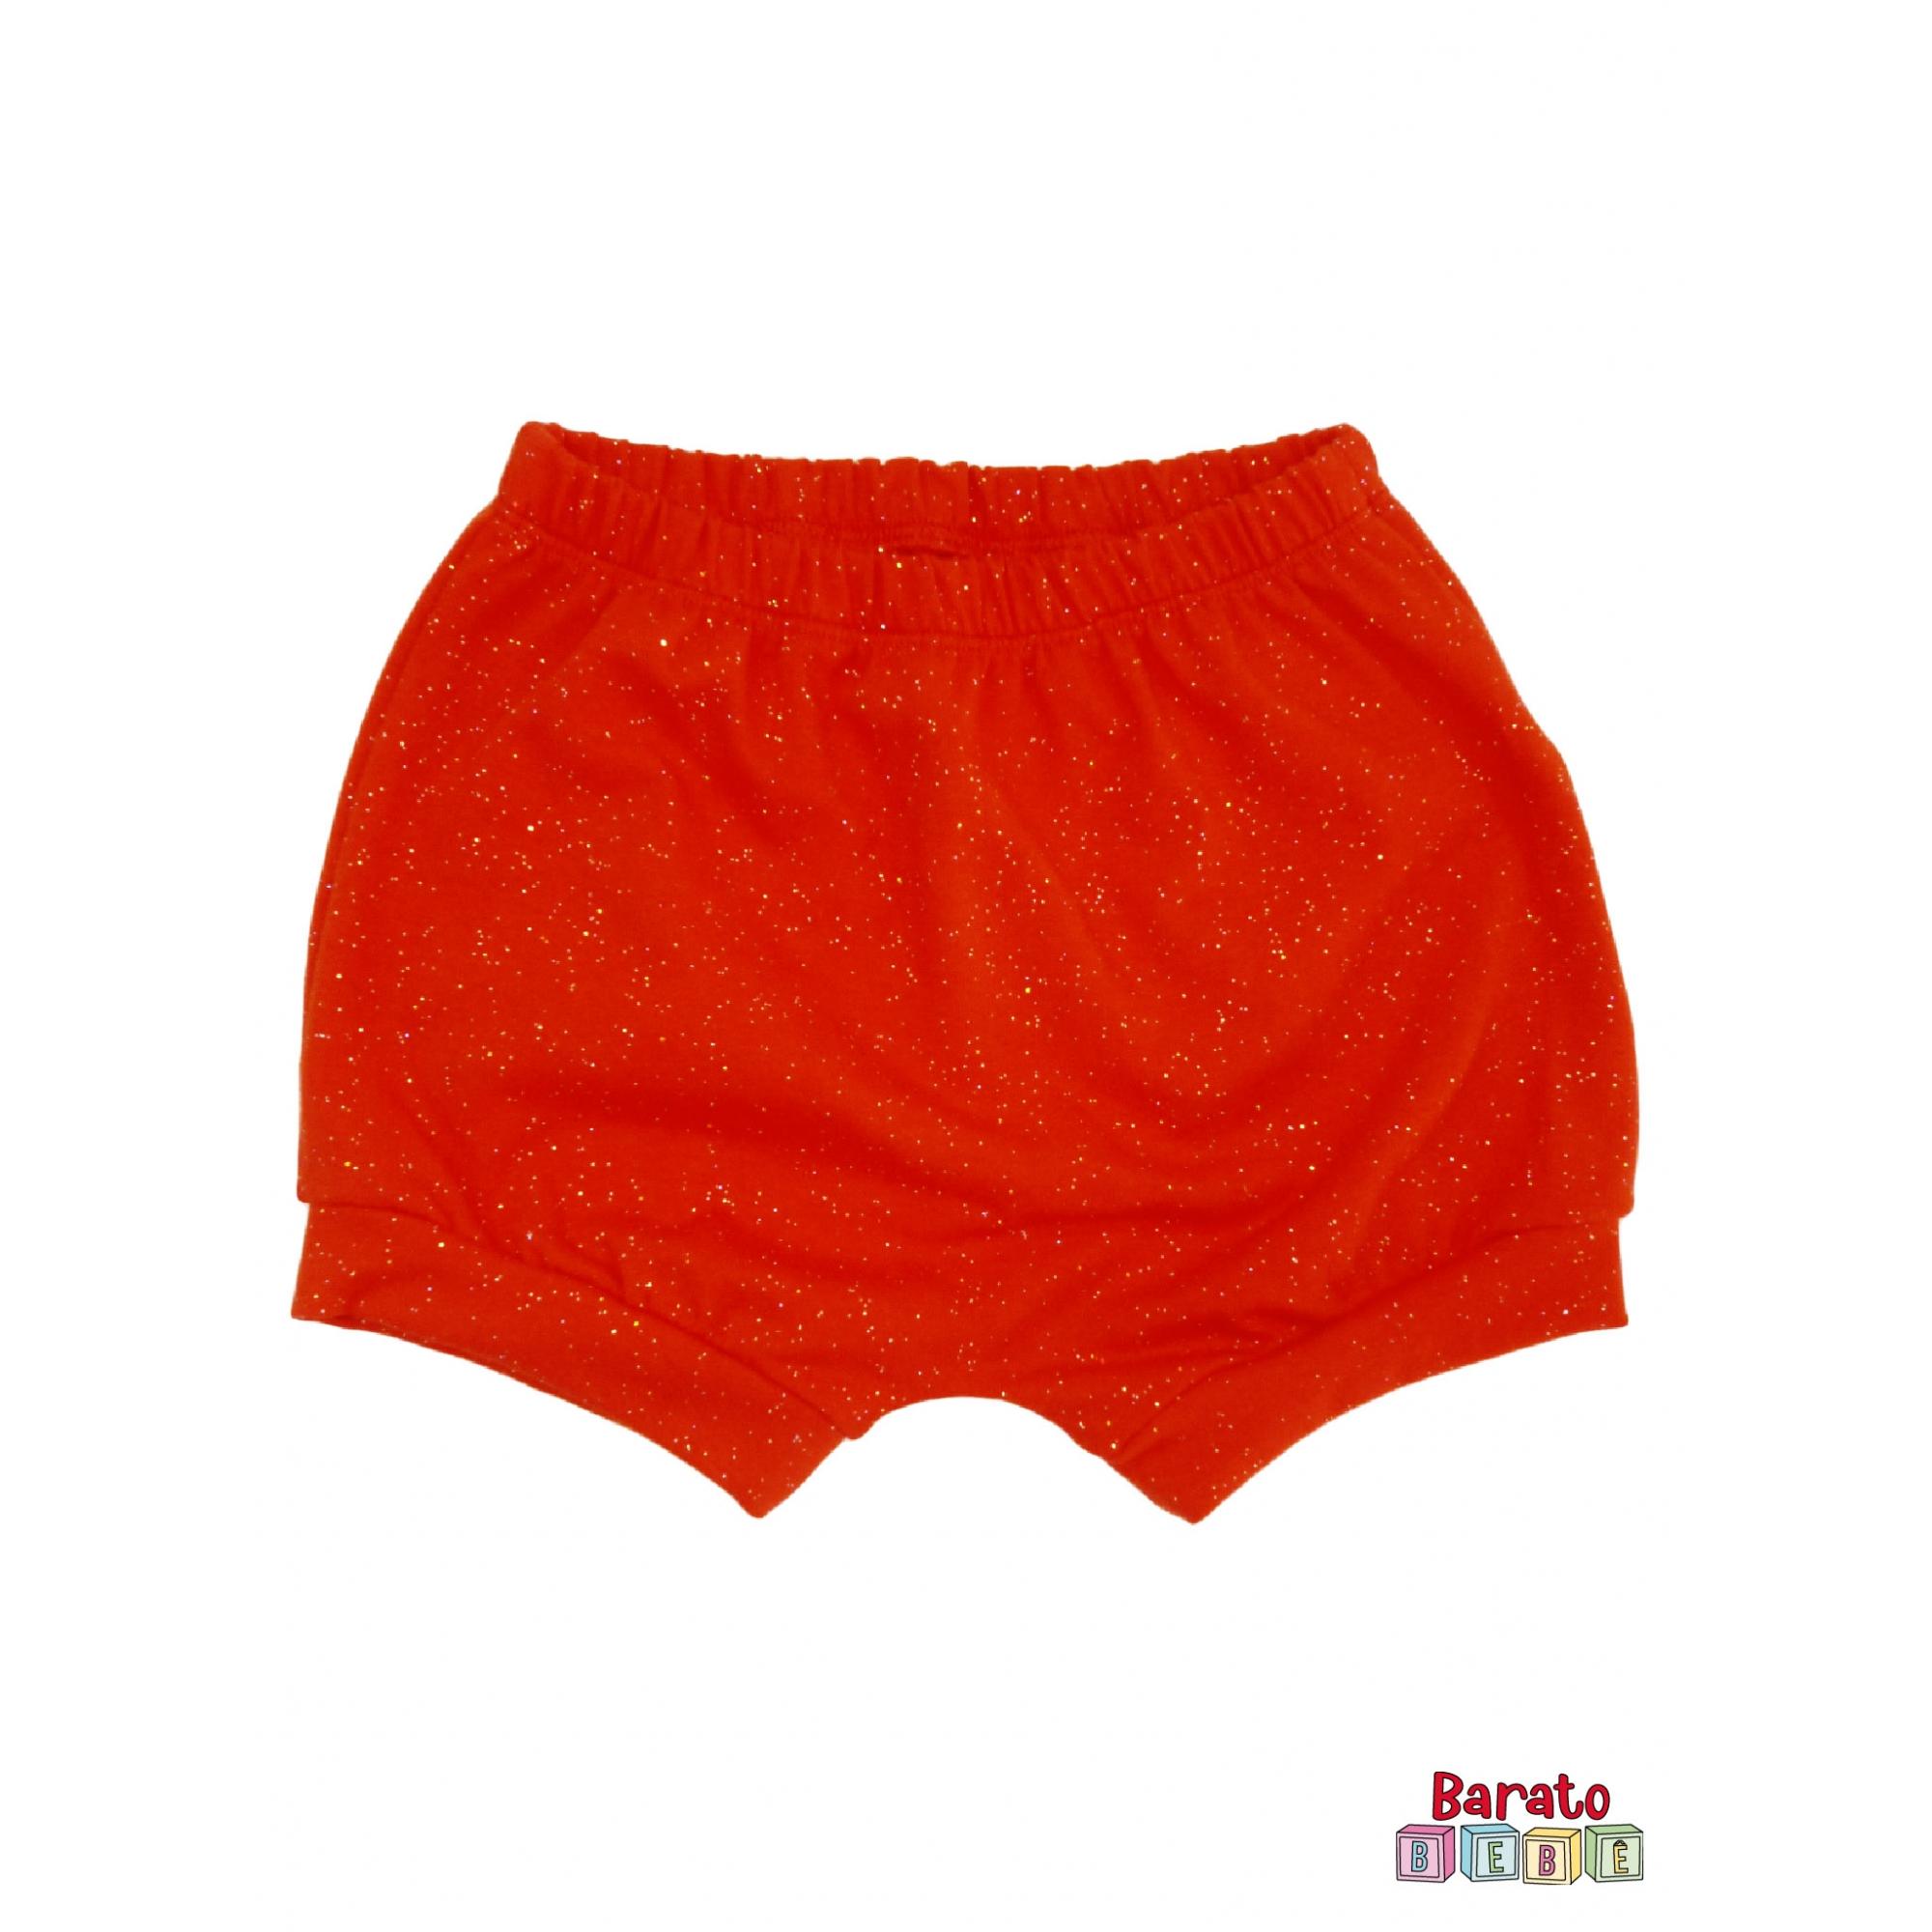 Shorts(Tapa Fralda) Bebê(P/M/G)  - Barato Bebê - Vermelho c/ Glitter